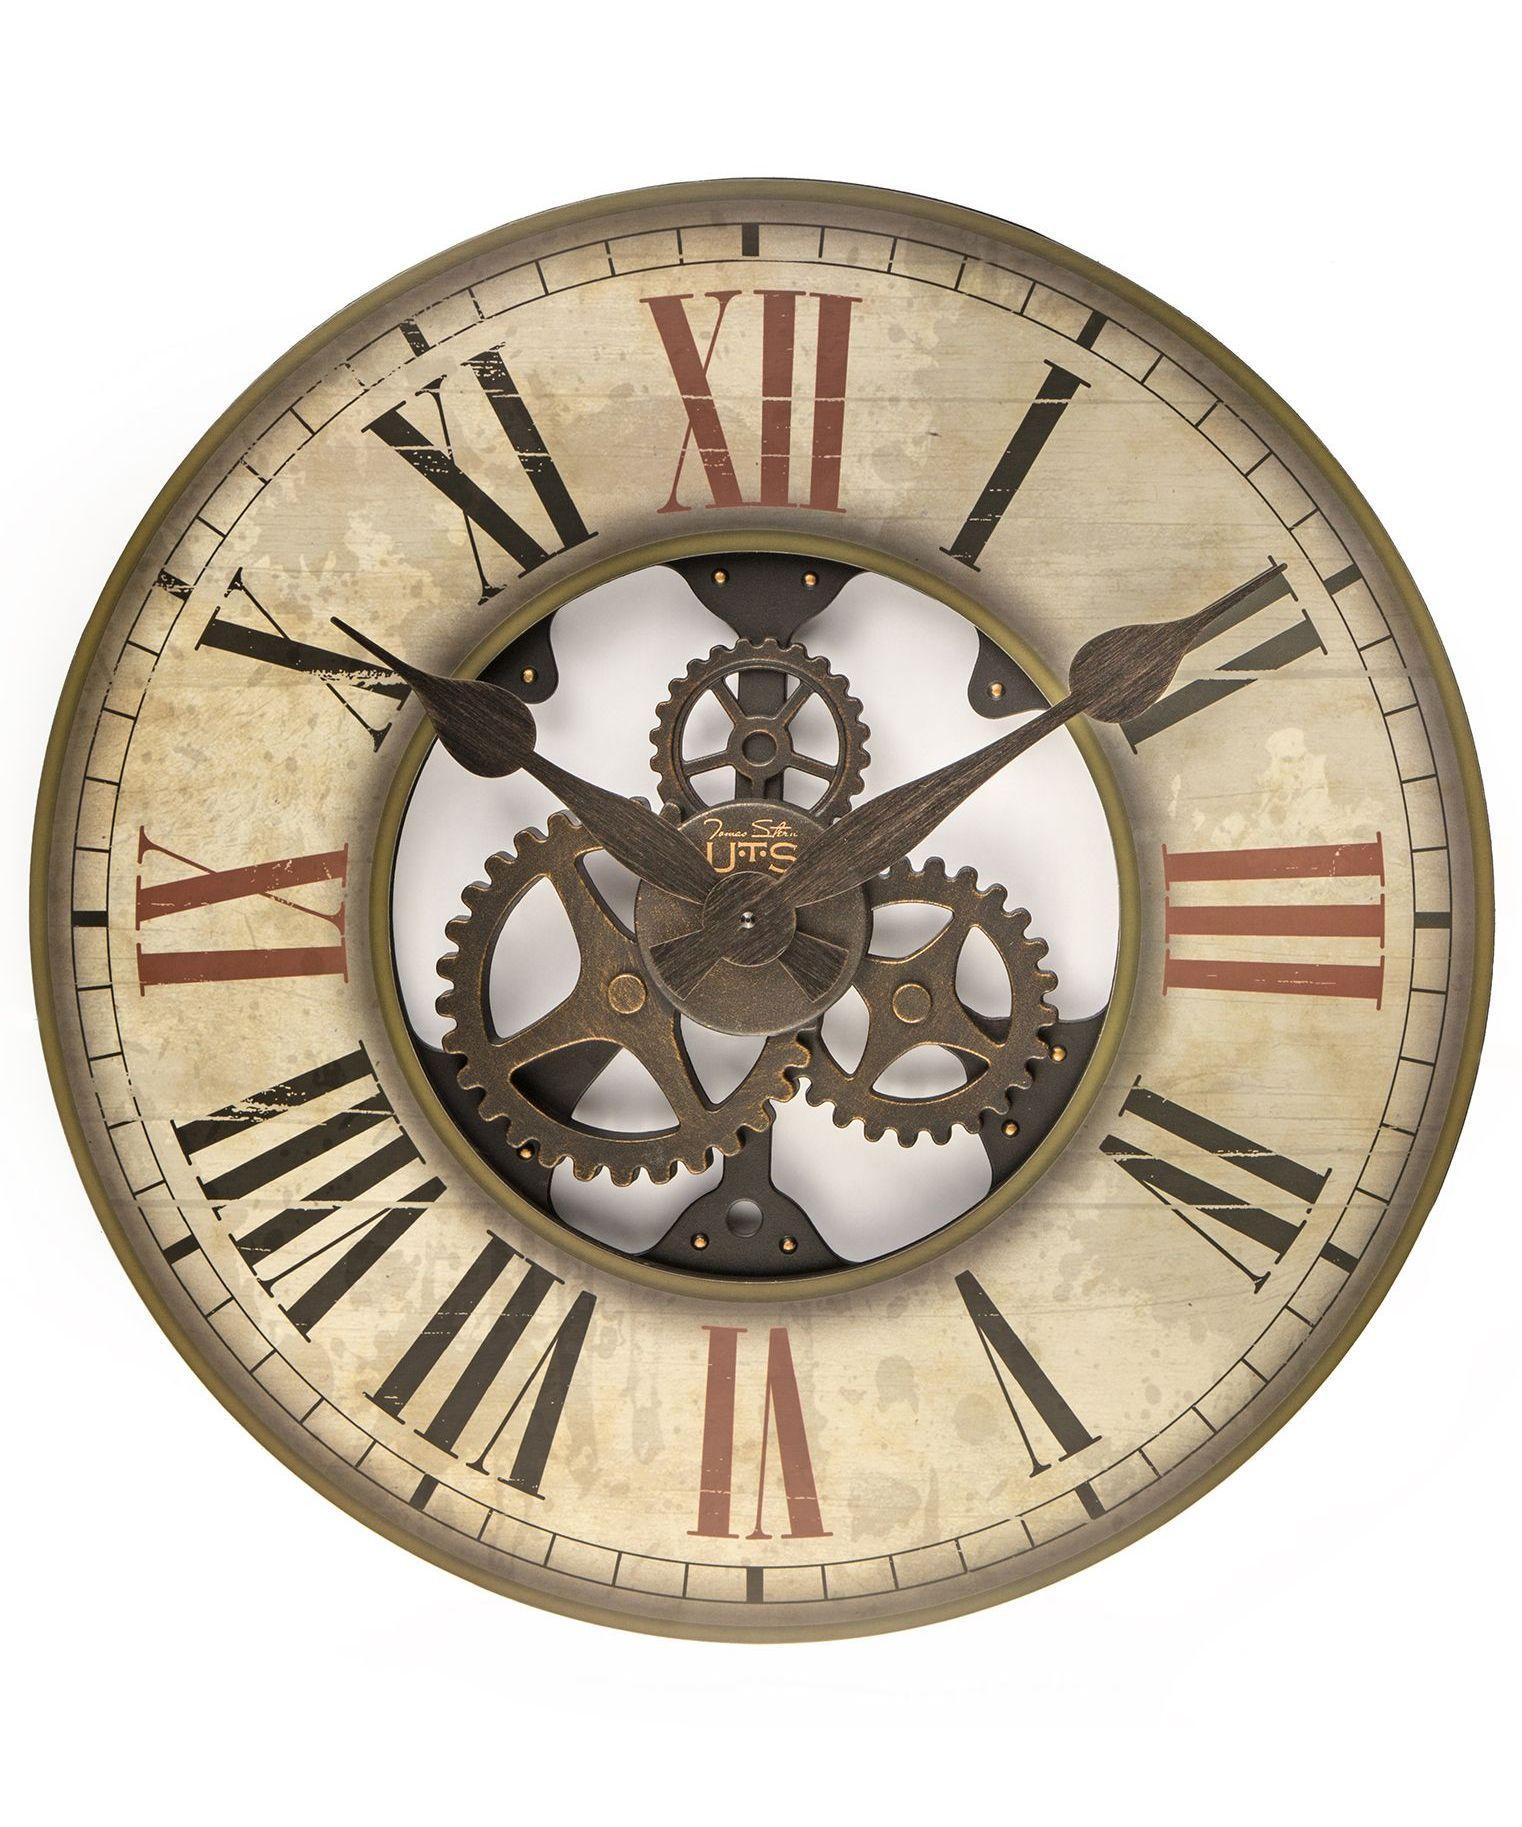 Часы настенные Часы настенные Tomas Stern 9015 chasy-nastennye-tomas-stern-9015-germaniya.jpg